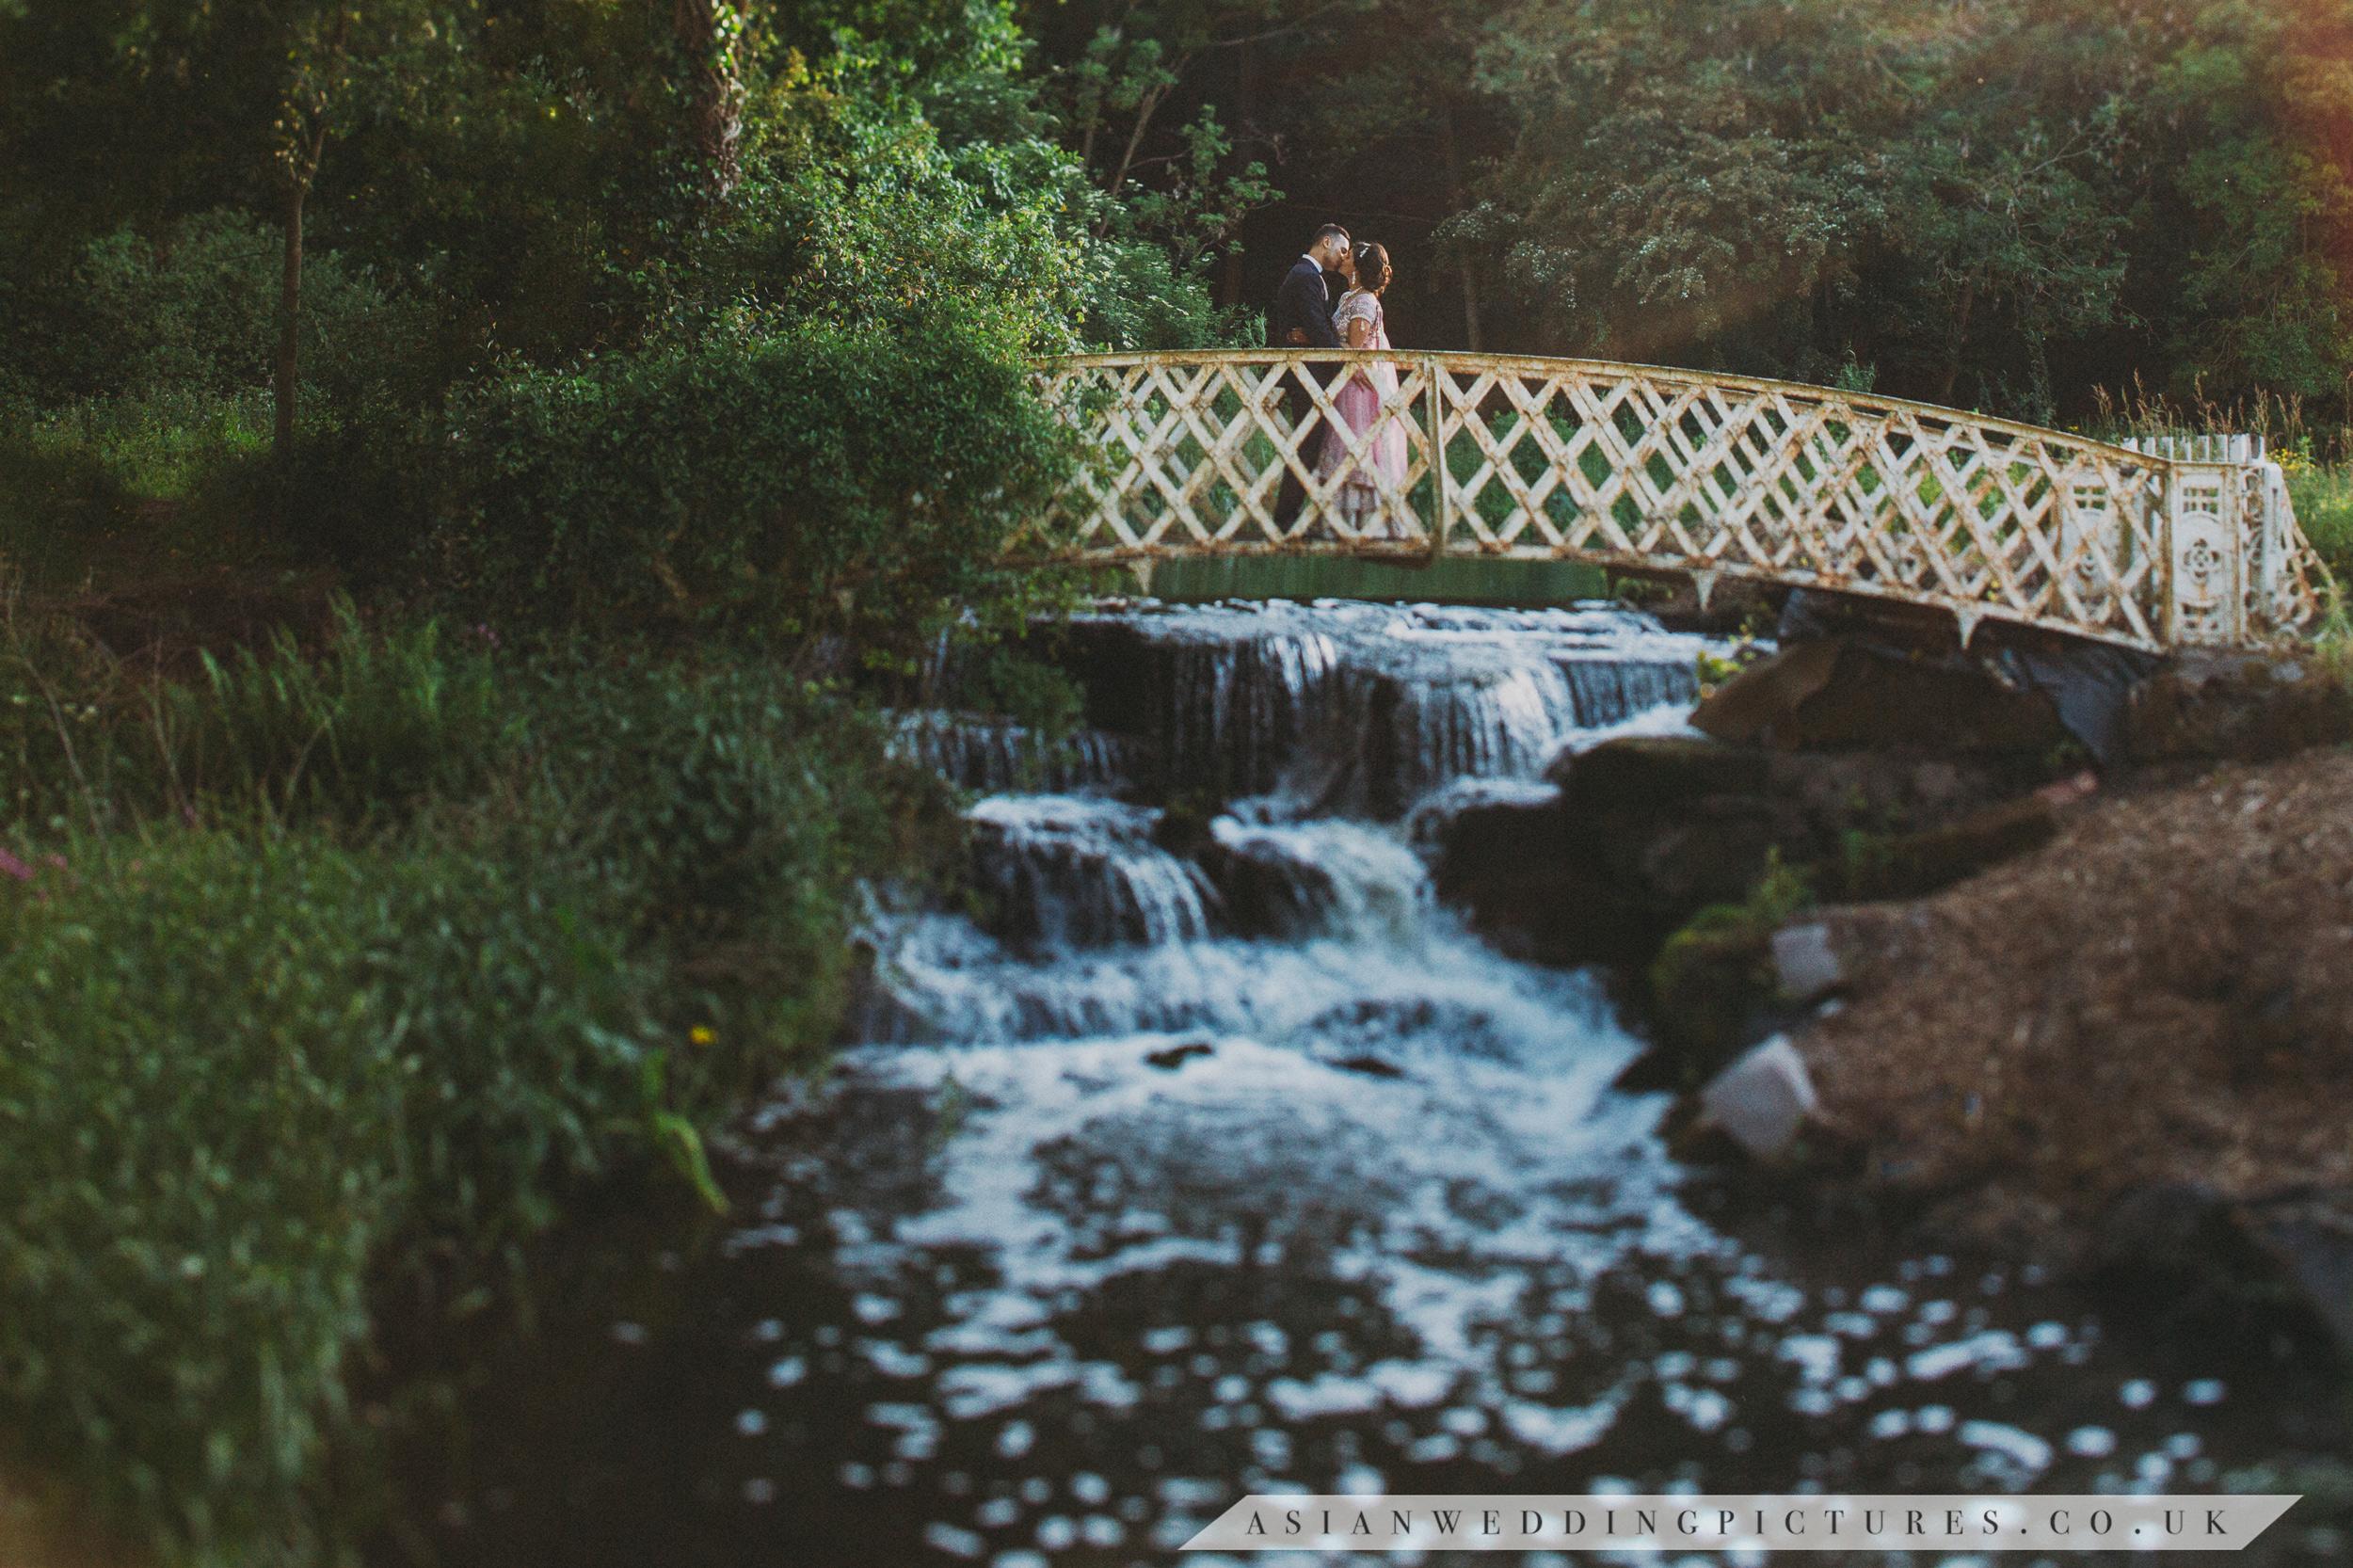 Asian-wedding-pictures-midlands.jpg